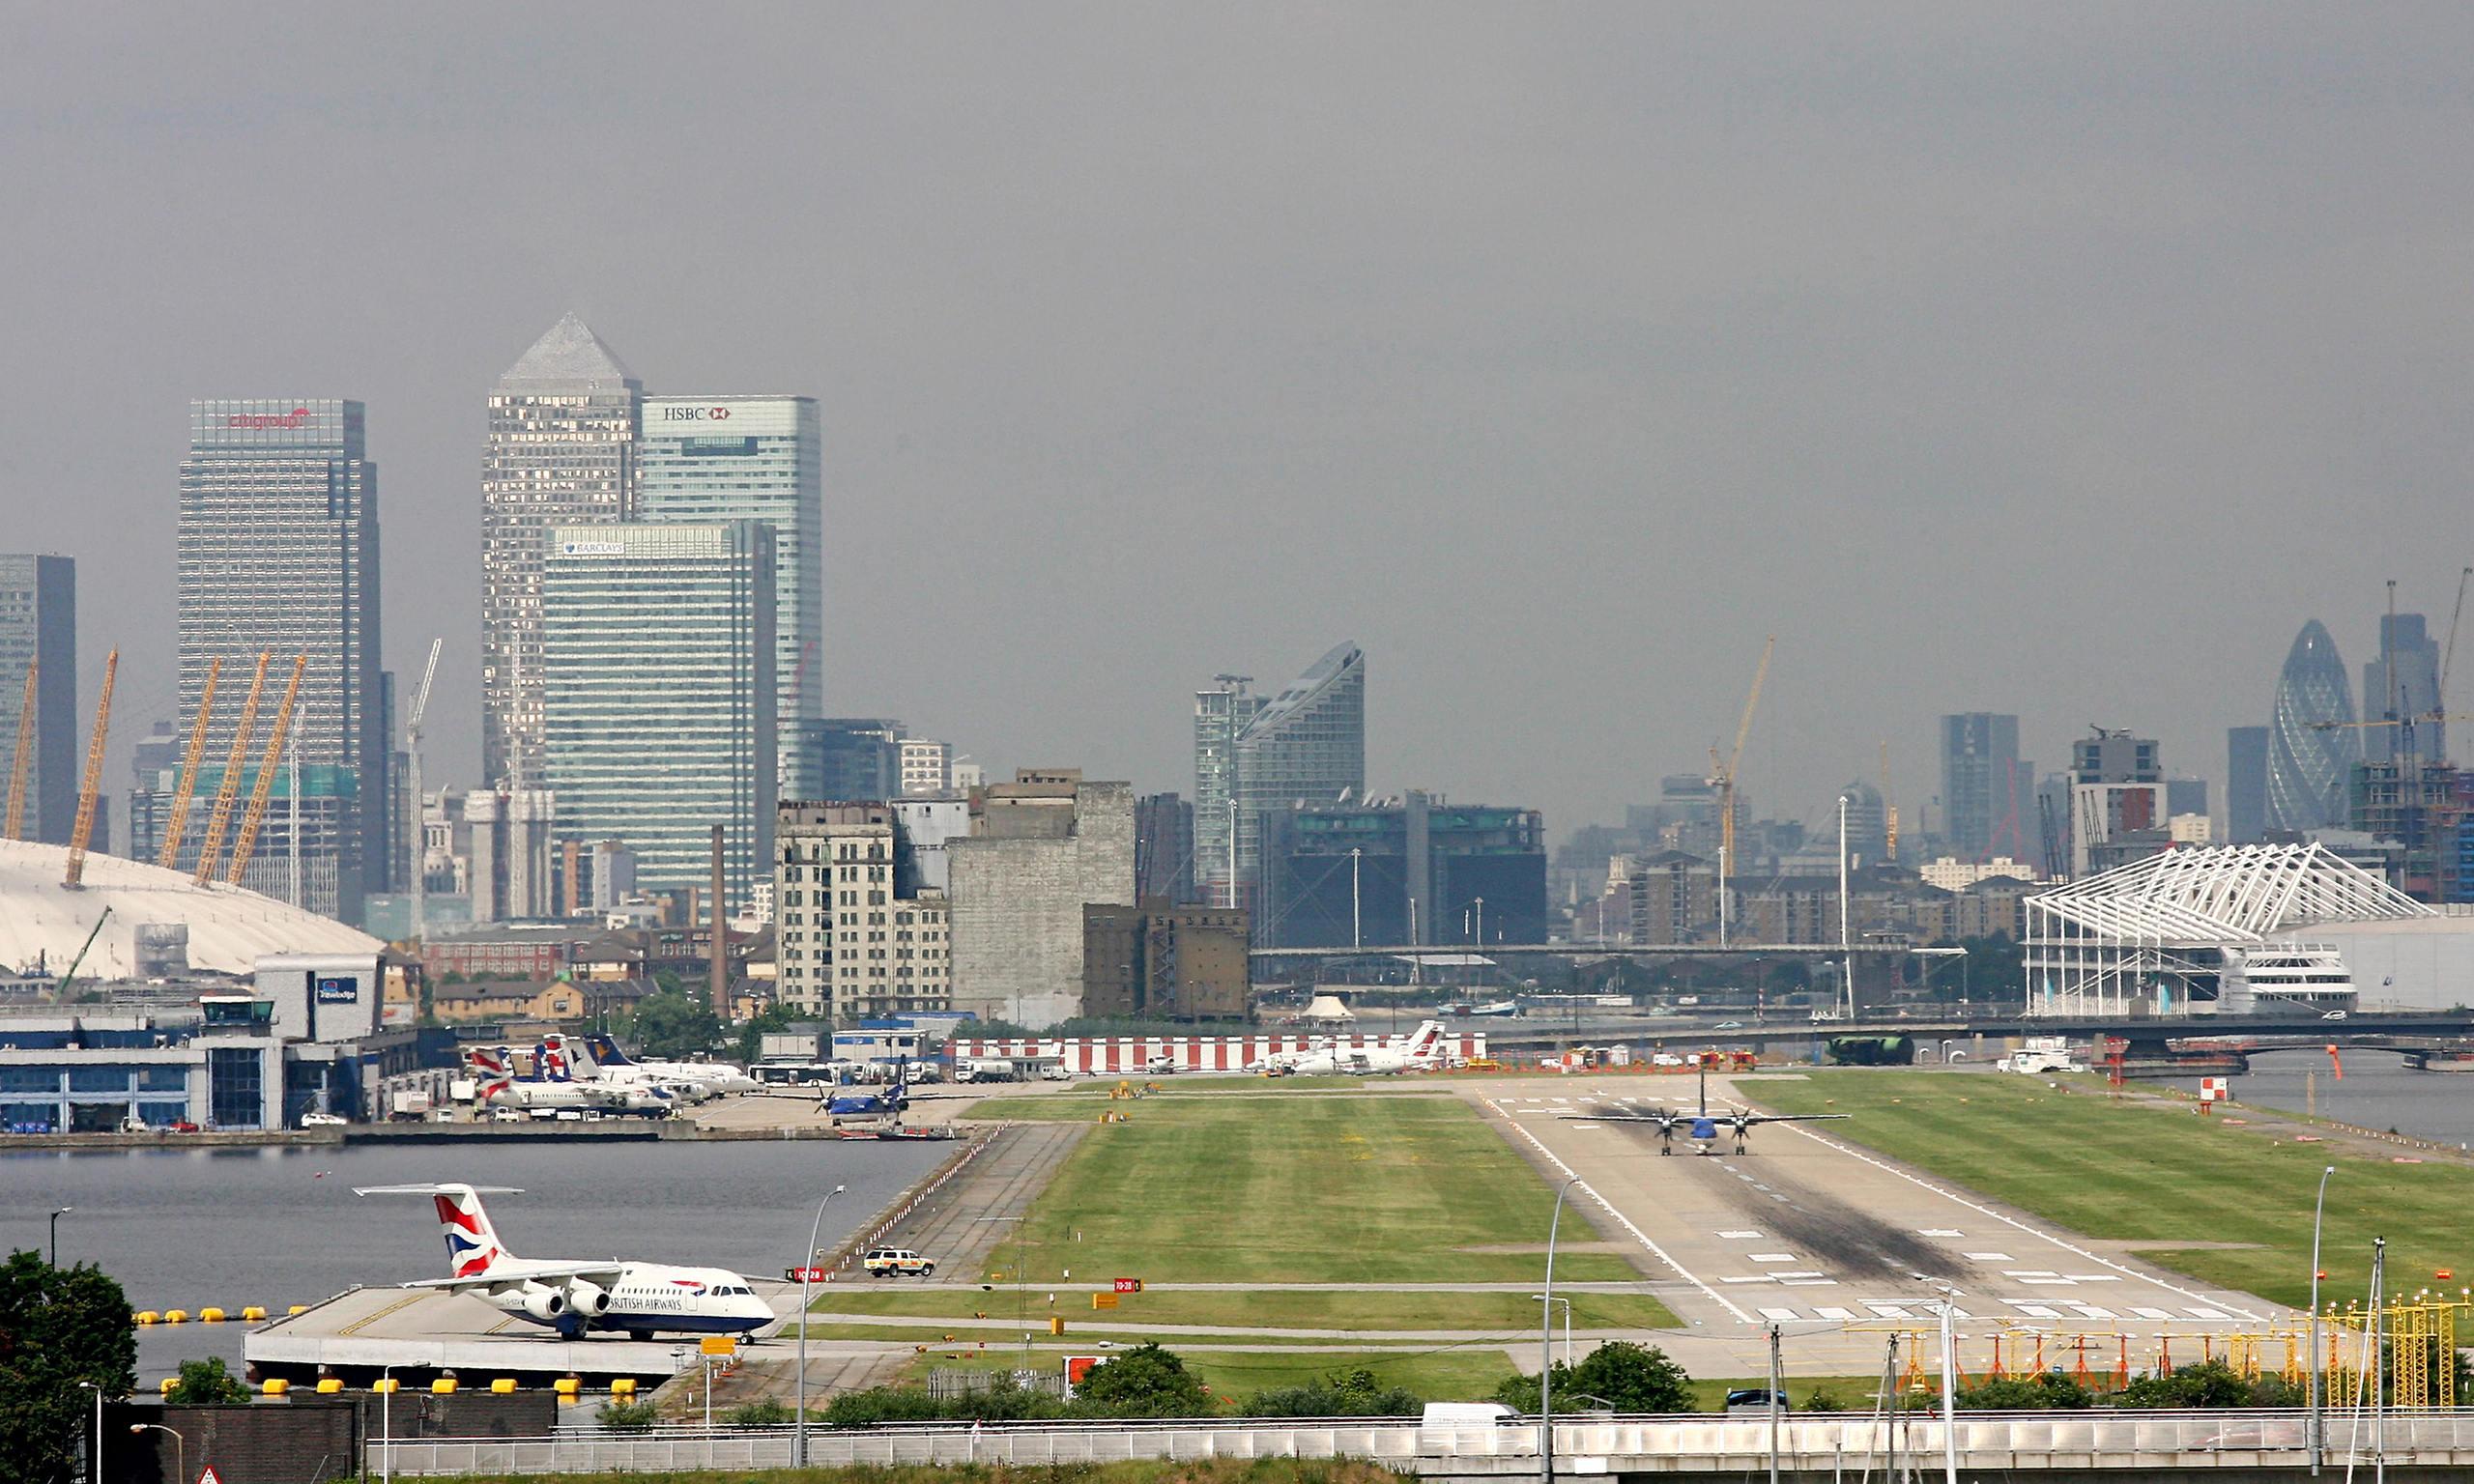 nasa rocket london - photo #34